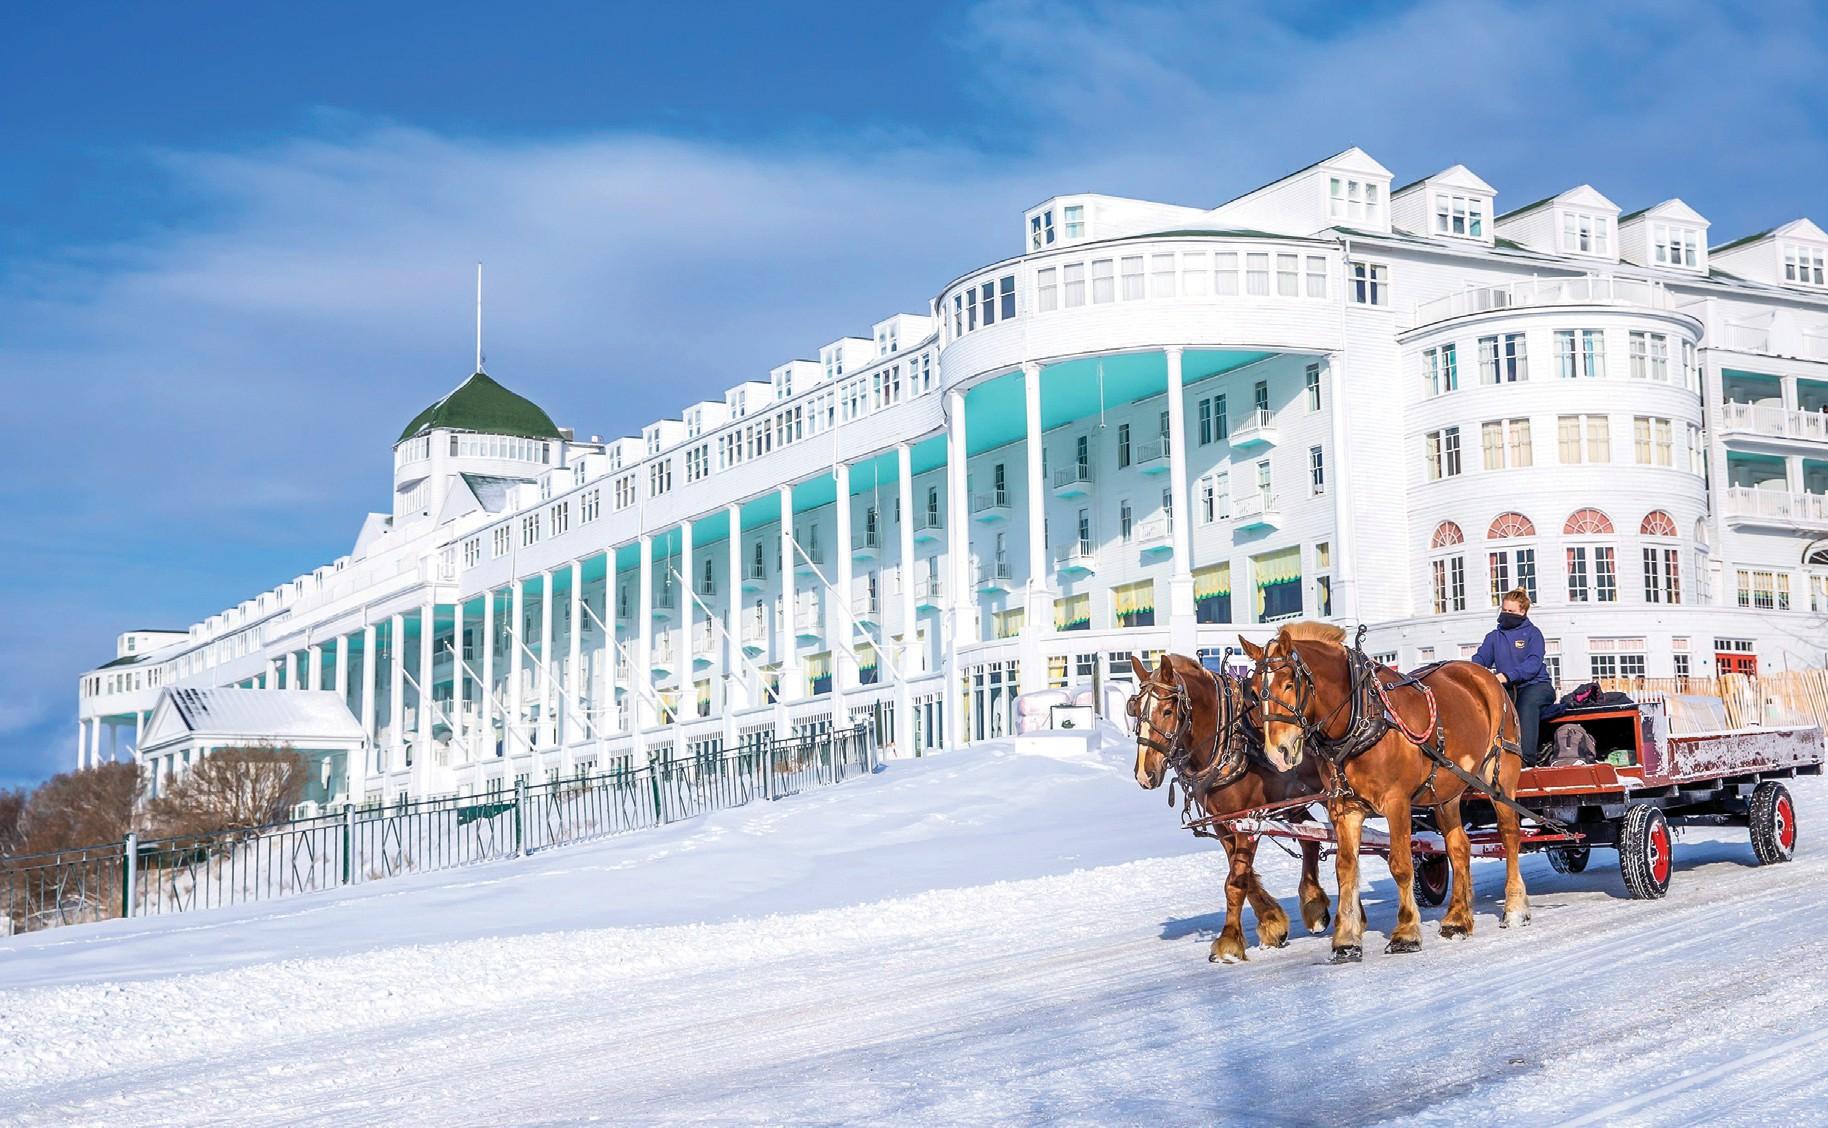 Grand Hotel Is Taking Coronavirus Outbreak Seriously Delaying Season Mackinac Town Crier